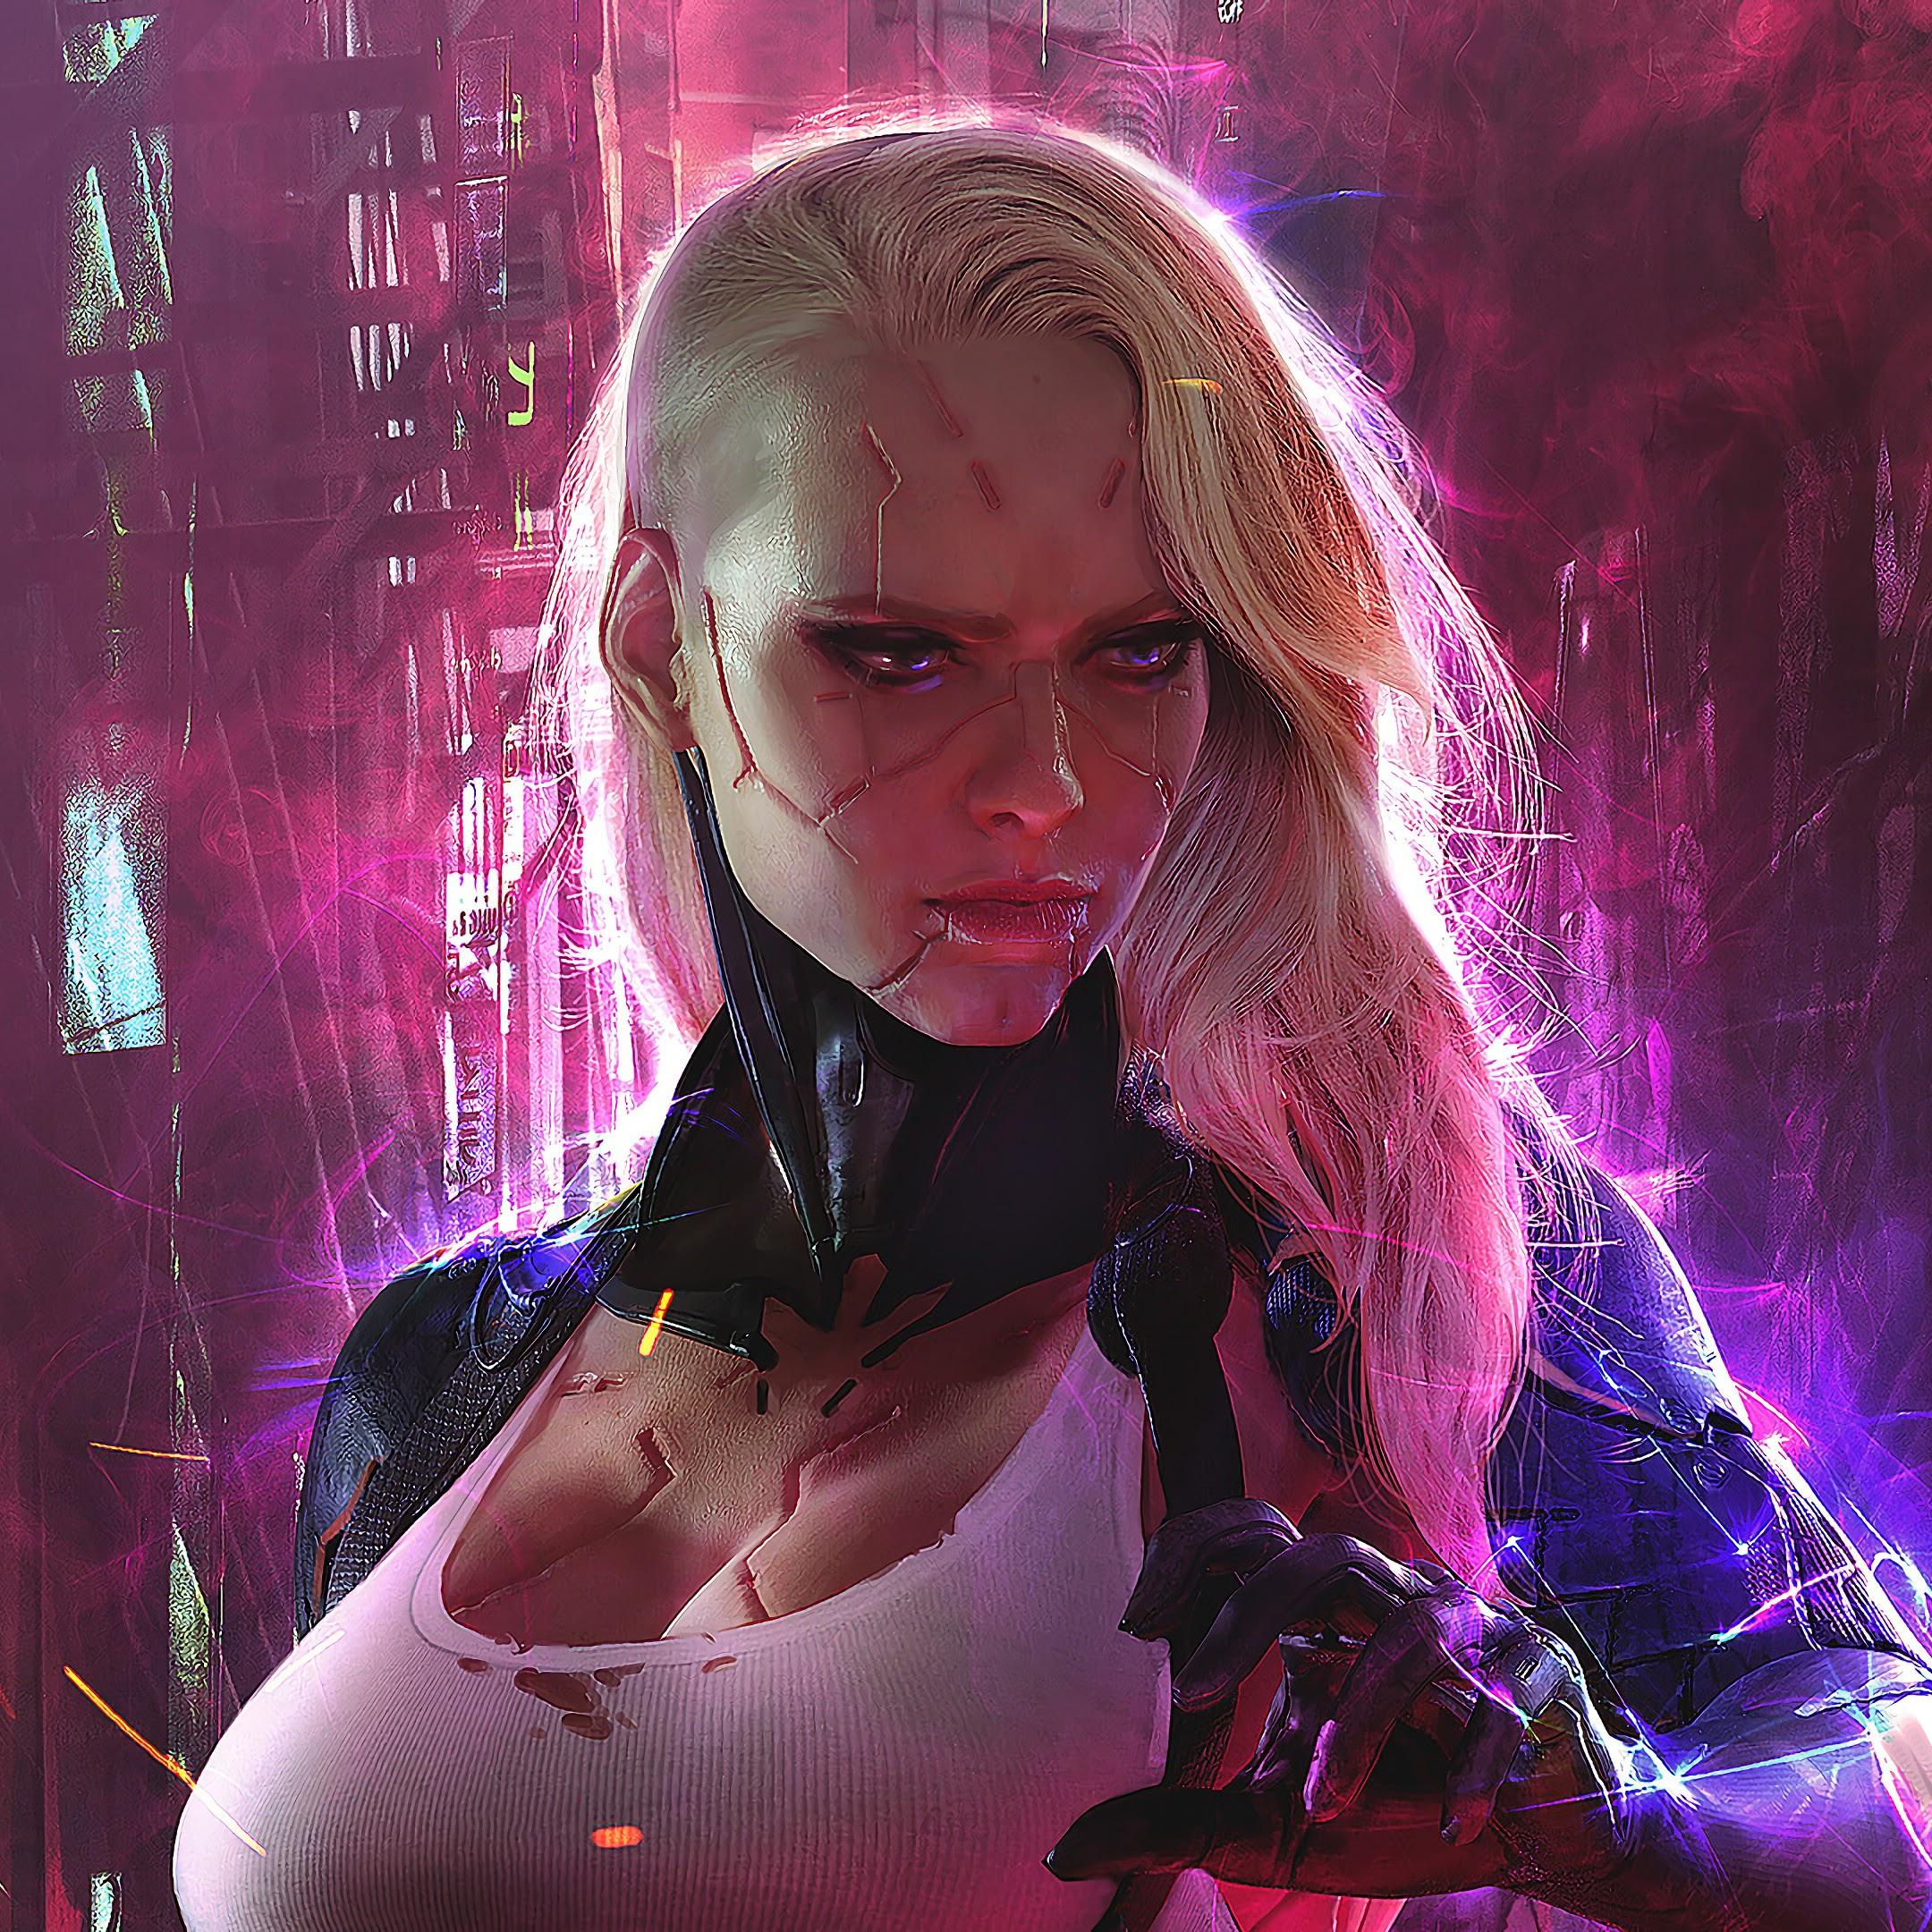 Cyberpunk Girl Sci Fi 4k 144 Wallpaper